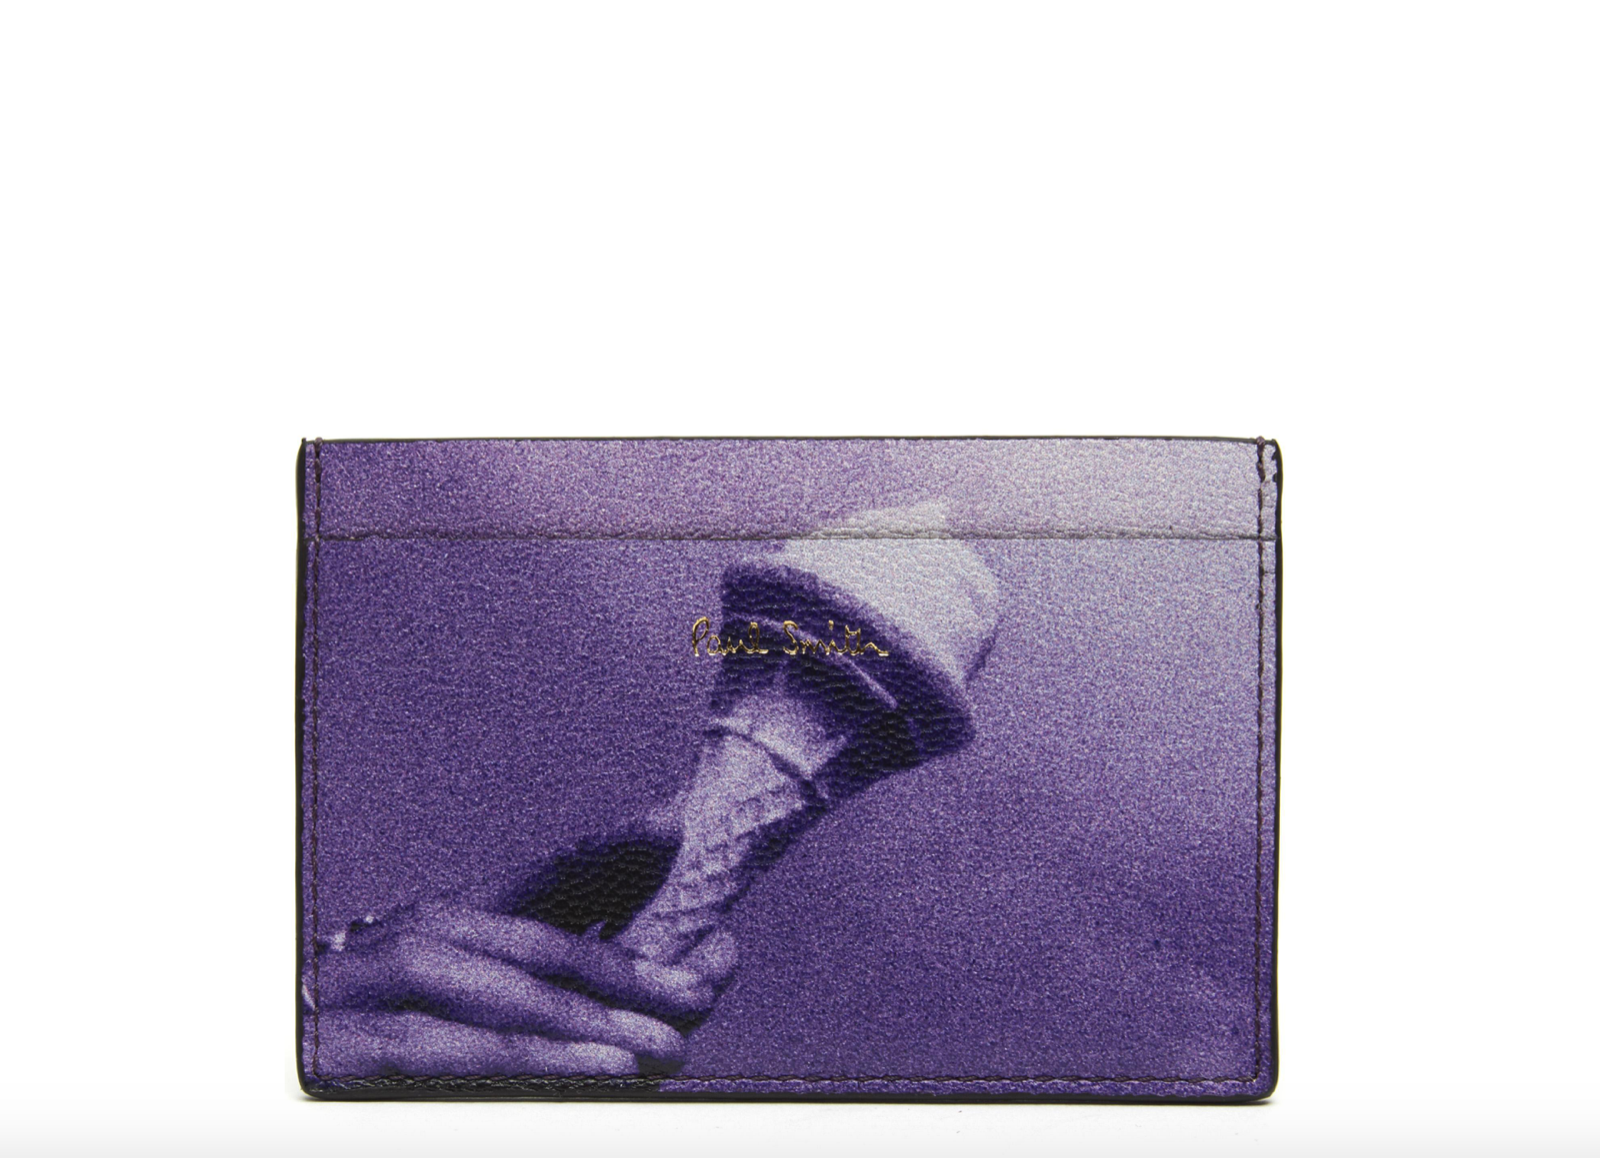 Paul Smith Wallet - BNWT Purple Ice Cream Credit Card Holder Case RRP: